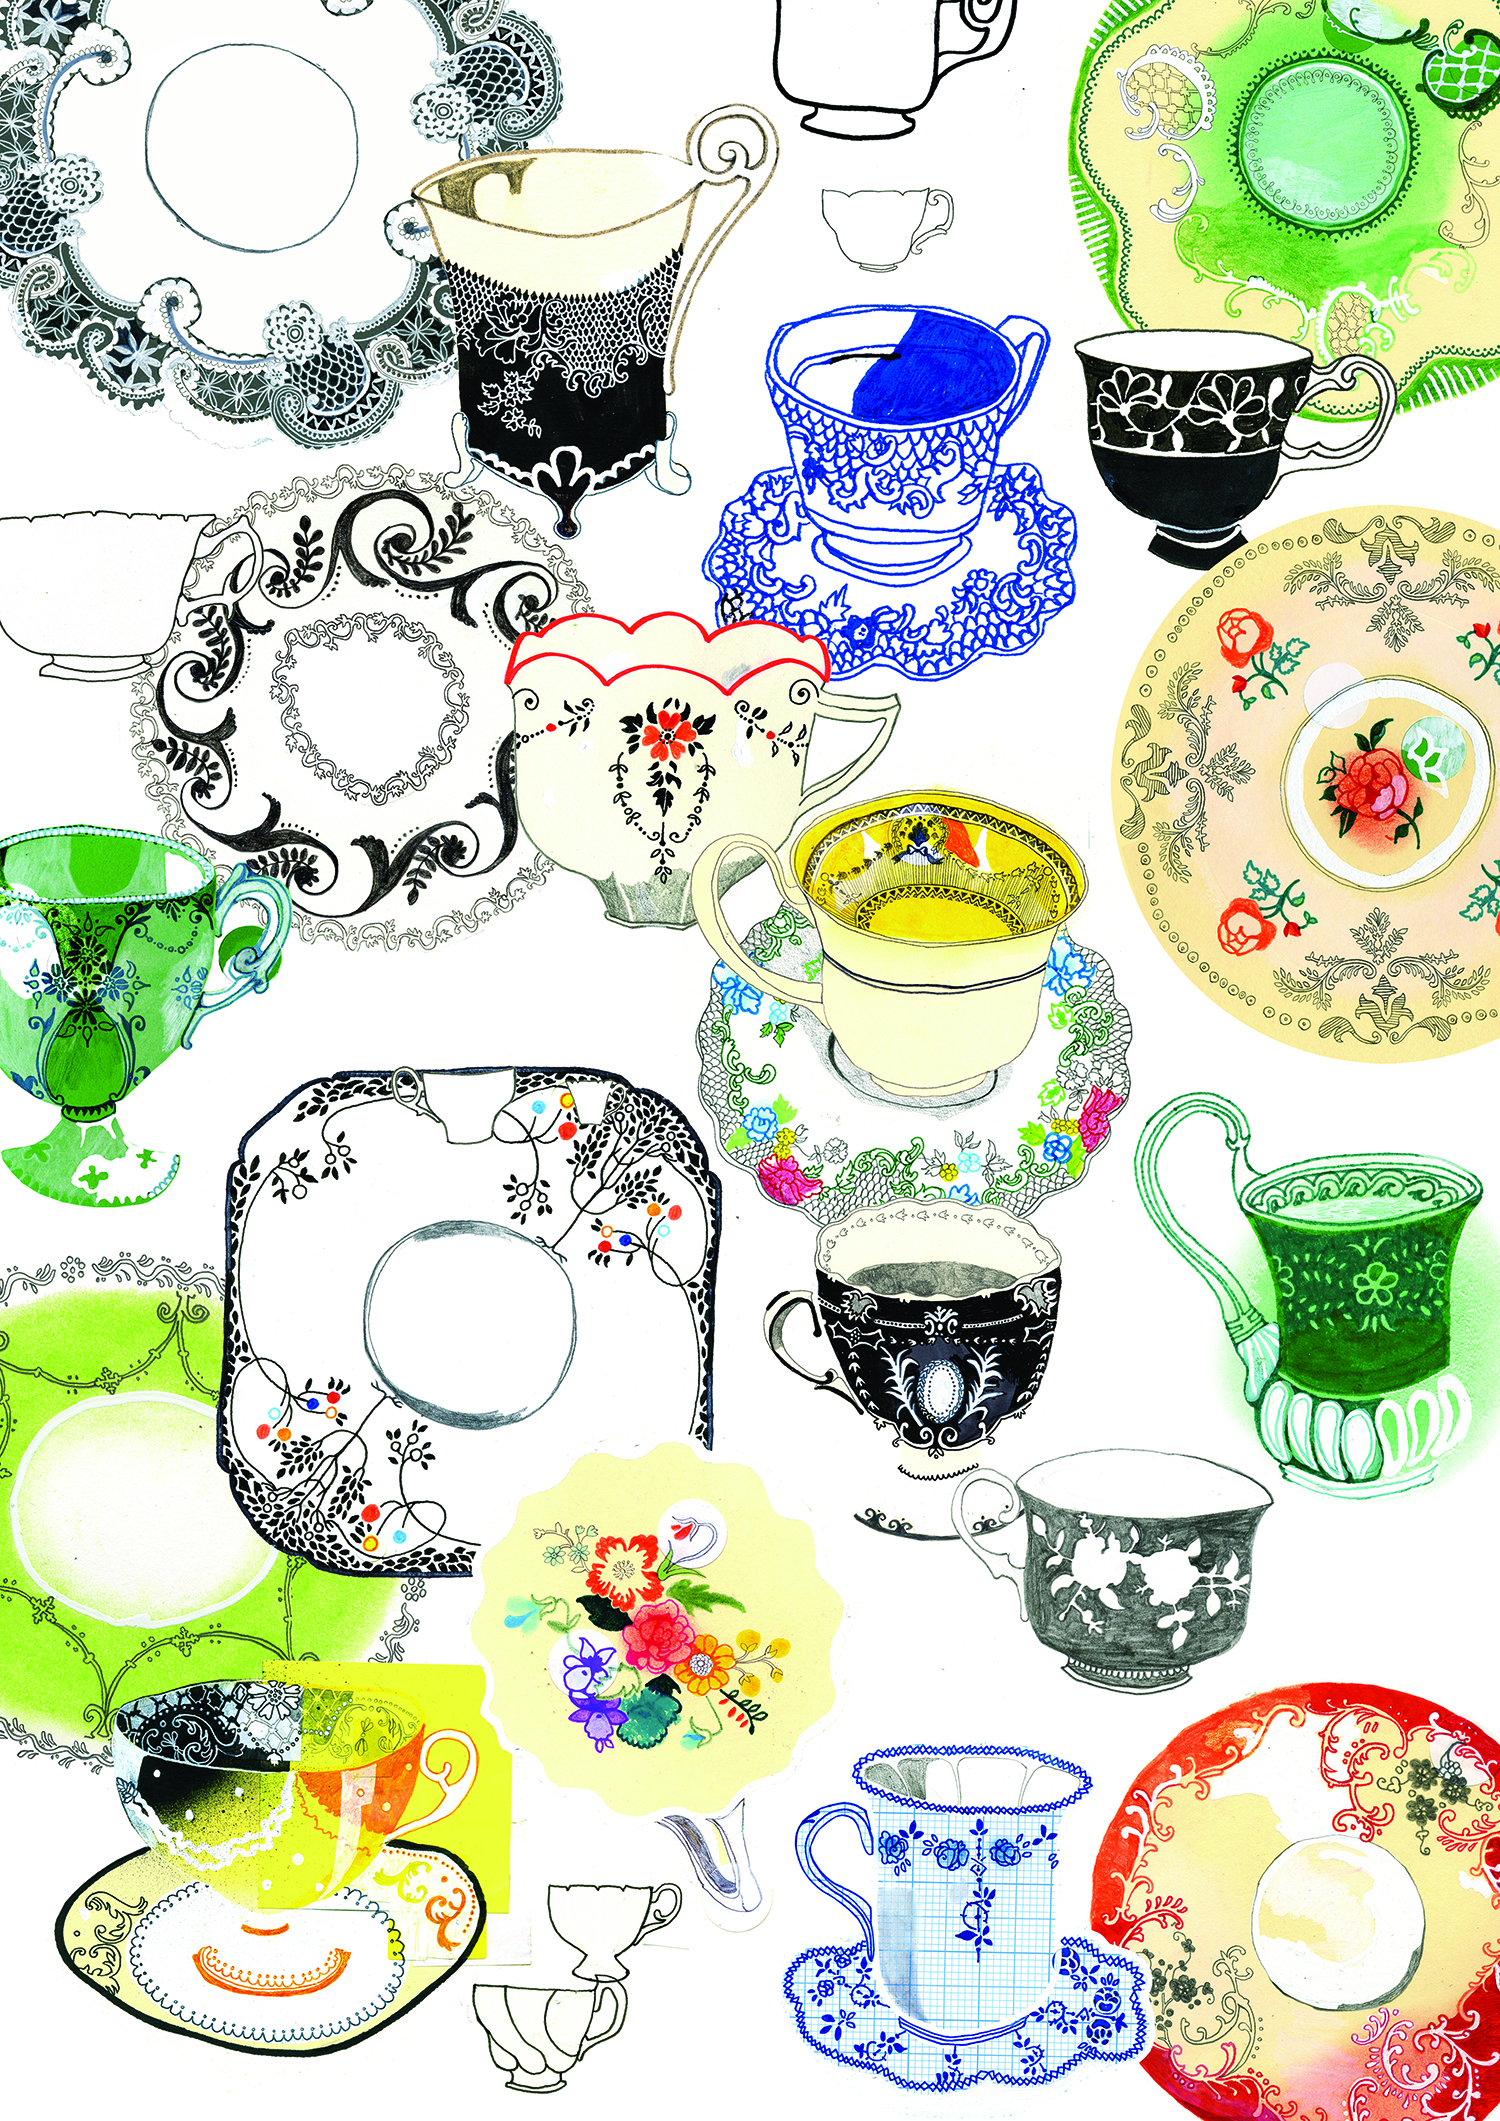 SOI 52 2011 - ARTIST: Hennie HaworthTITLE: Tea setsCLIENT: Habitat UK